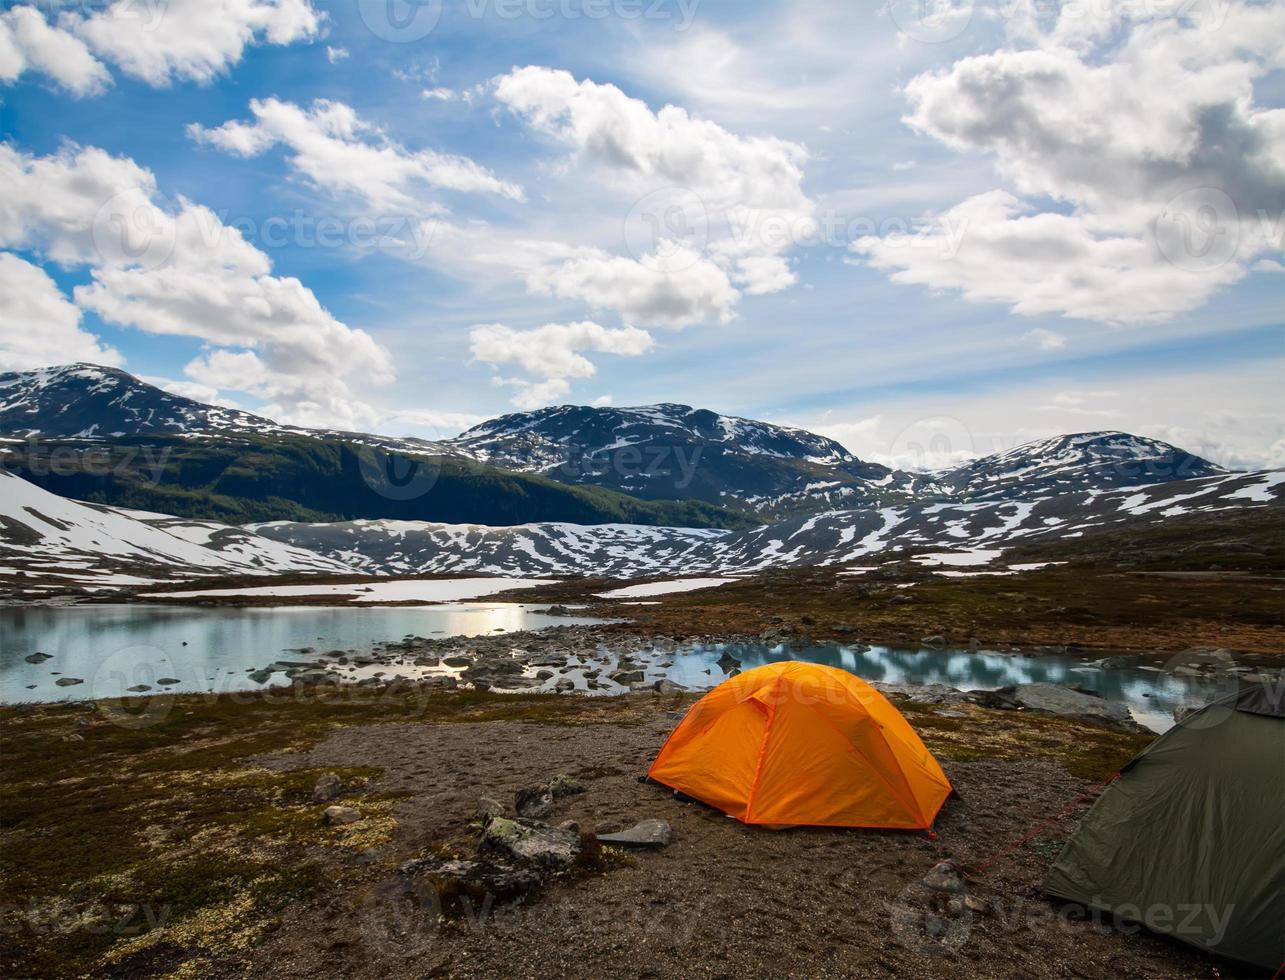 two tourist tents, active lifestyle photo